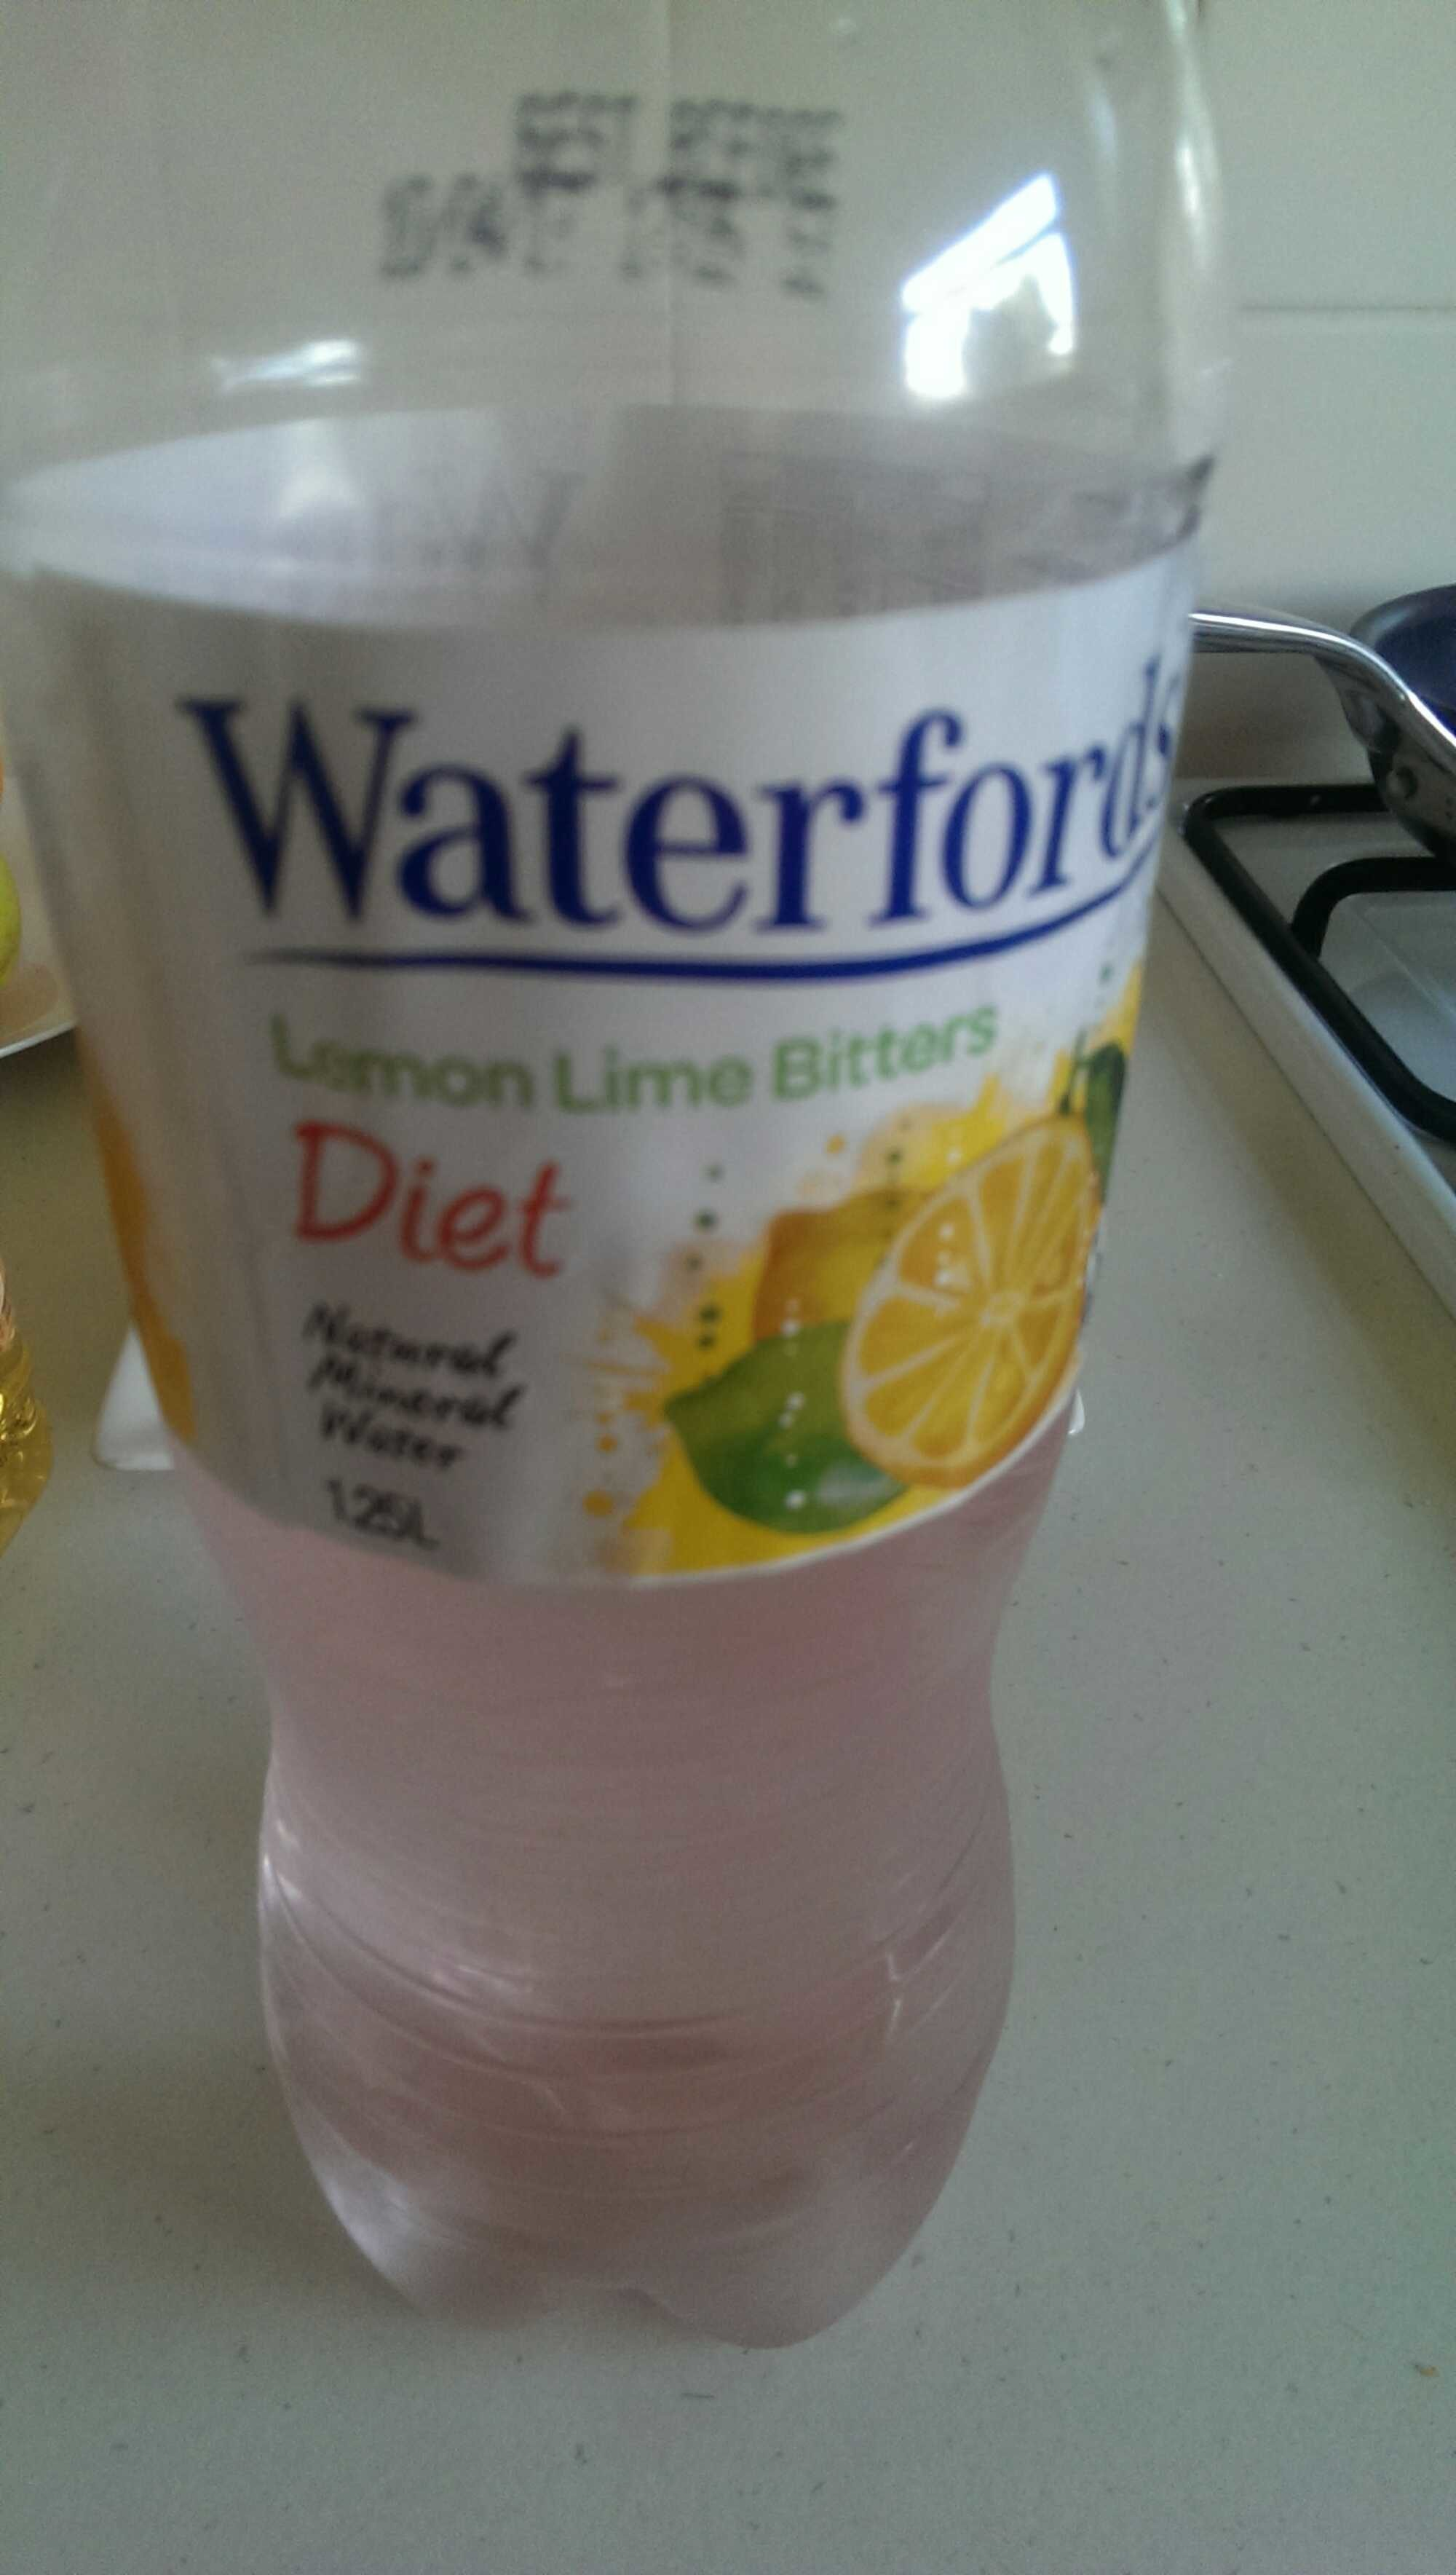 Lemon Lime Bitters Diet - Product - en